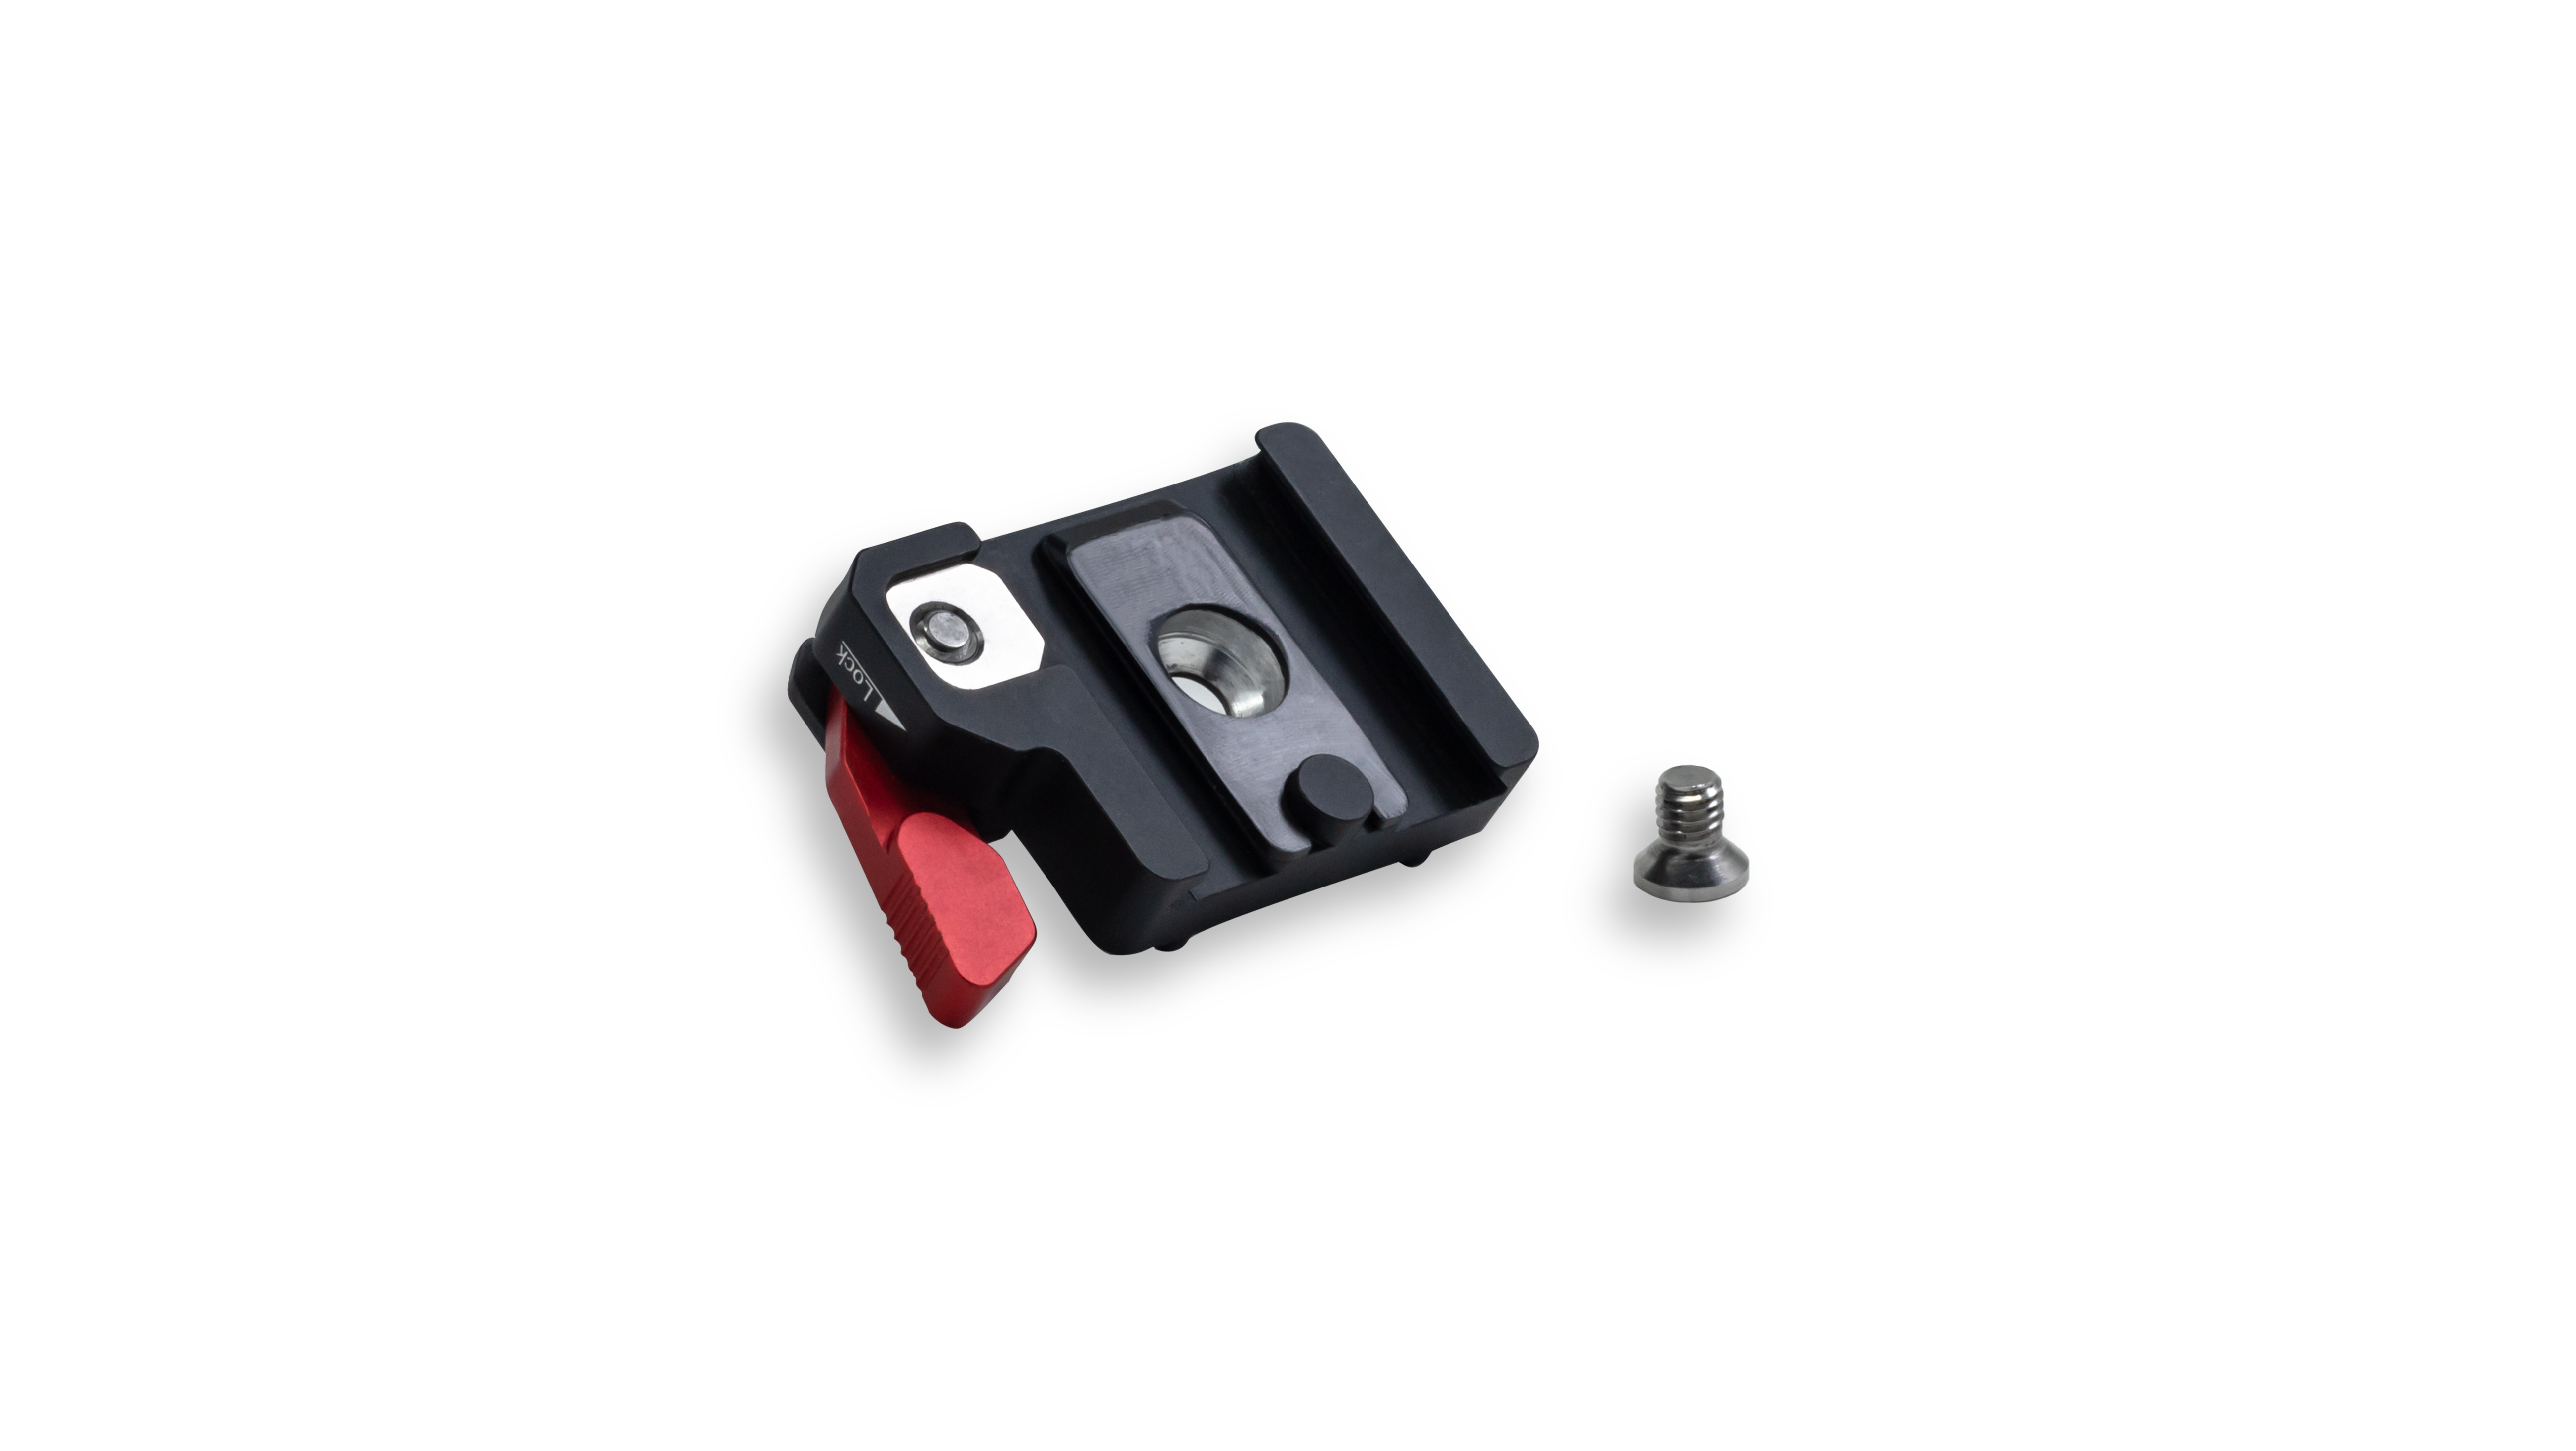 Nucleus-Nano Hand Wheel Attachment Plate for Tilta Gravity G2X and DJI Ronin-S